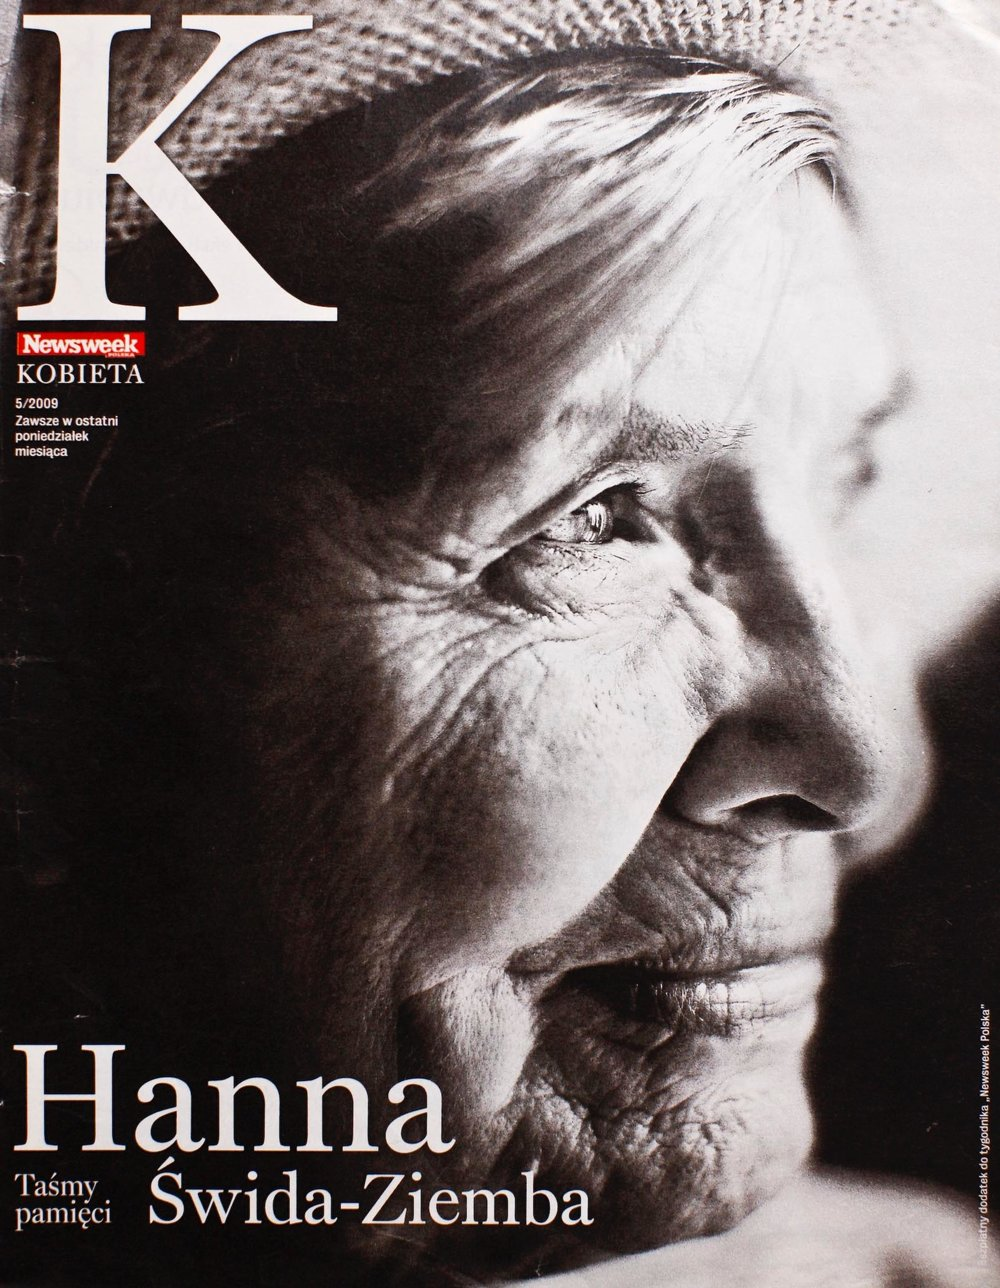 NEWSWEEK KOBIETA 5/2009